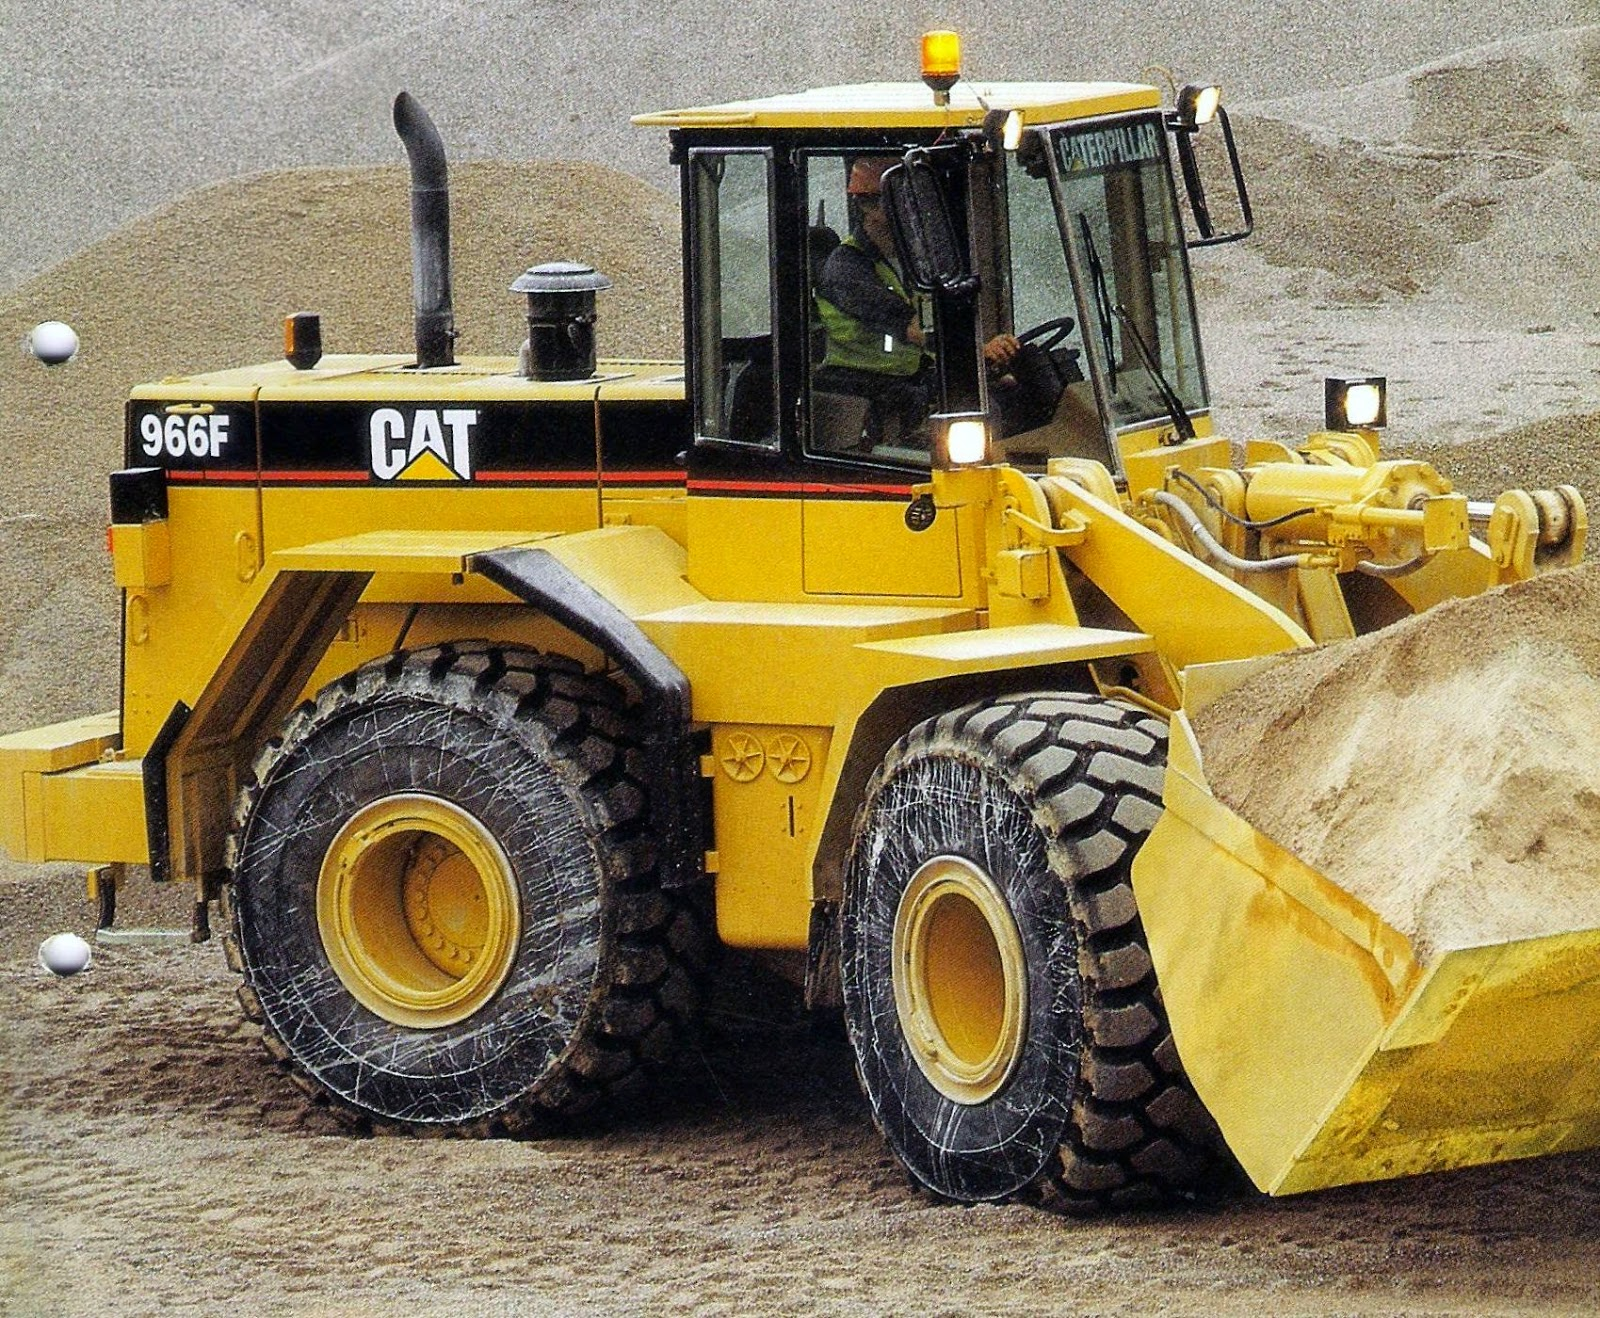 hydraulic system troubleshooting wheel loader 966f series ii rh manualheavyequipment blogspot com 966 Loader Bucket 966F Cab